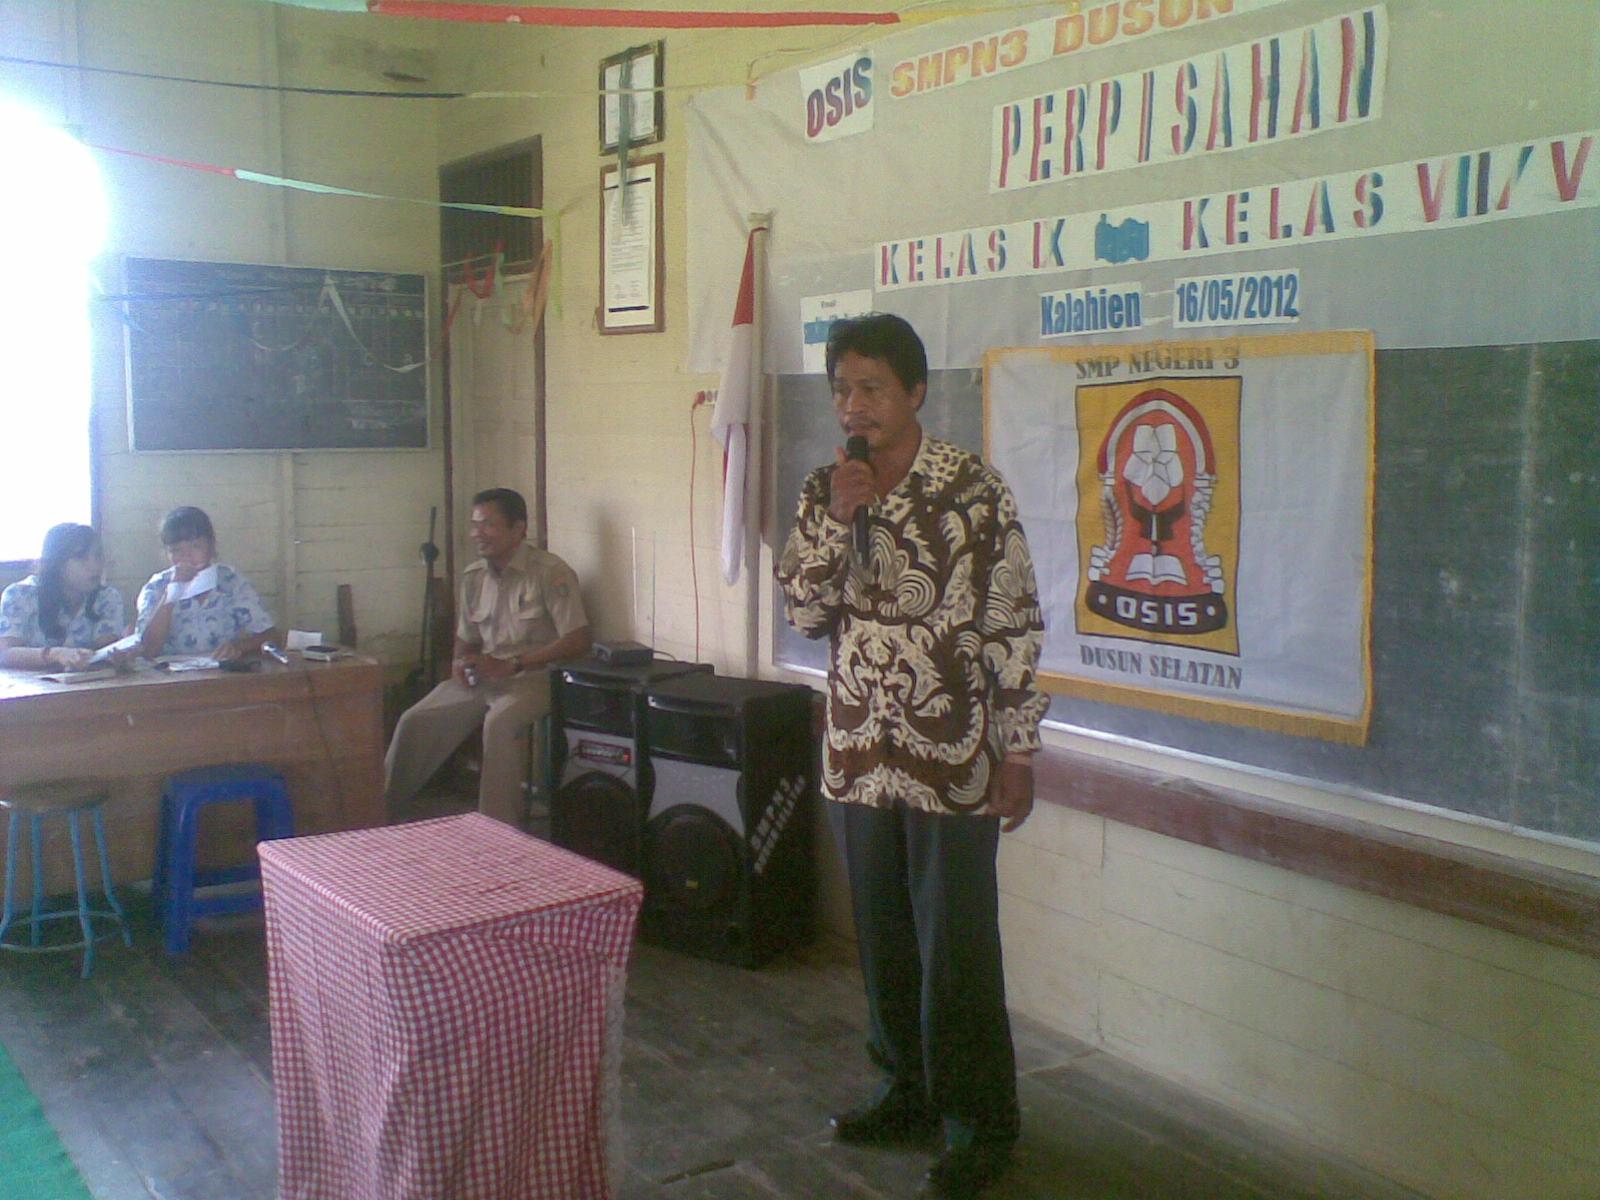 Sambutan Ketua Komite SMPN 3 Dusun Selatan Dalam Acara Perpisahan